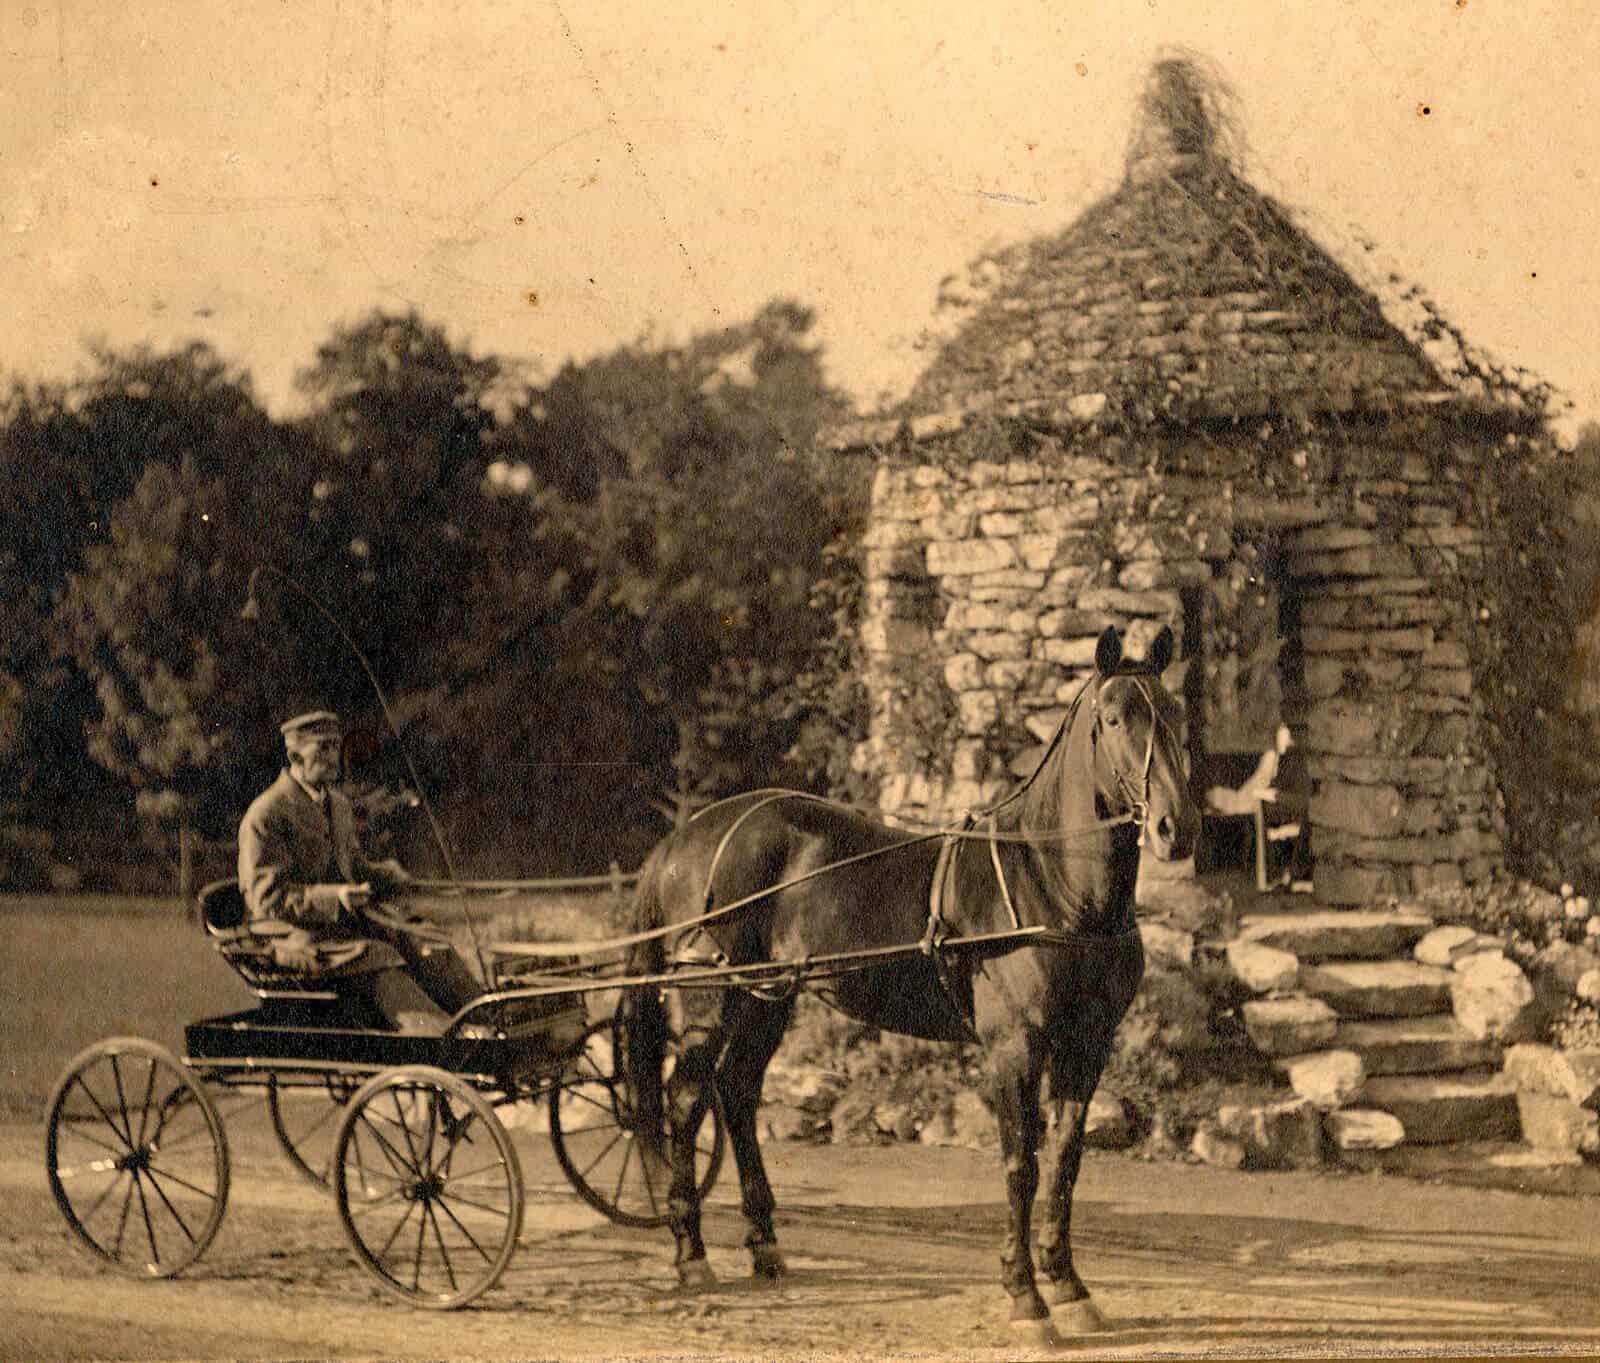 Stone summerhouse at 1900